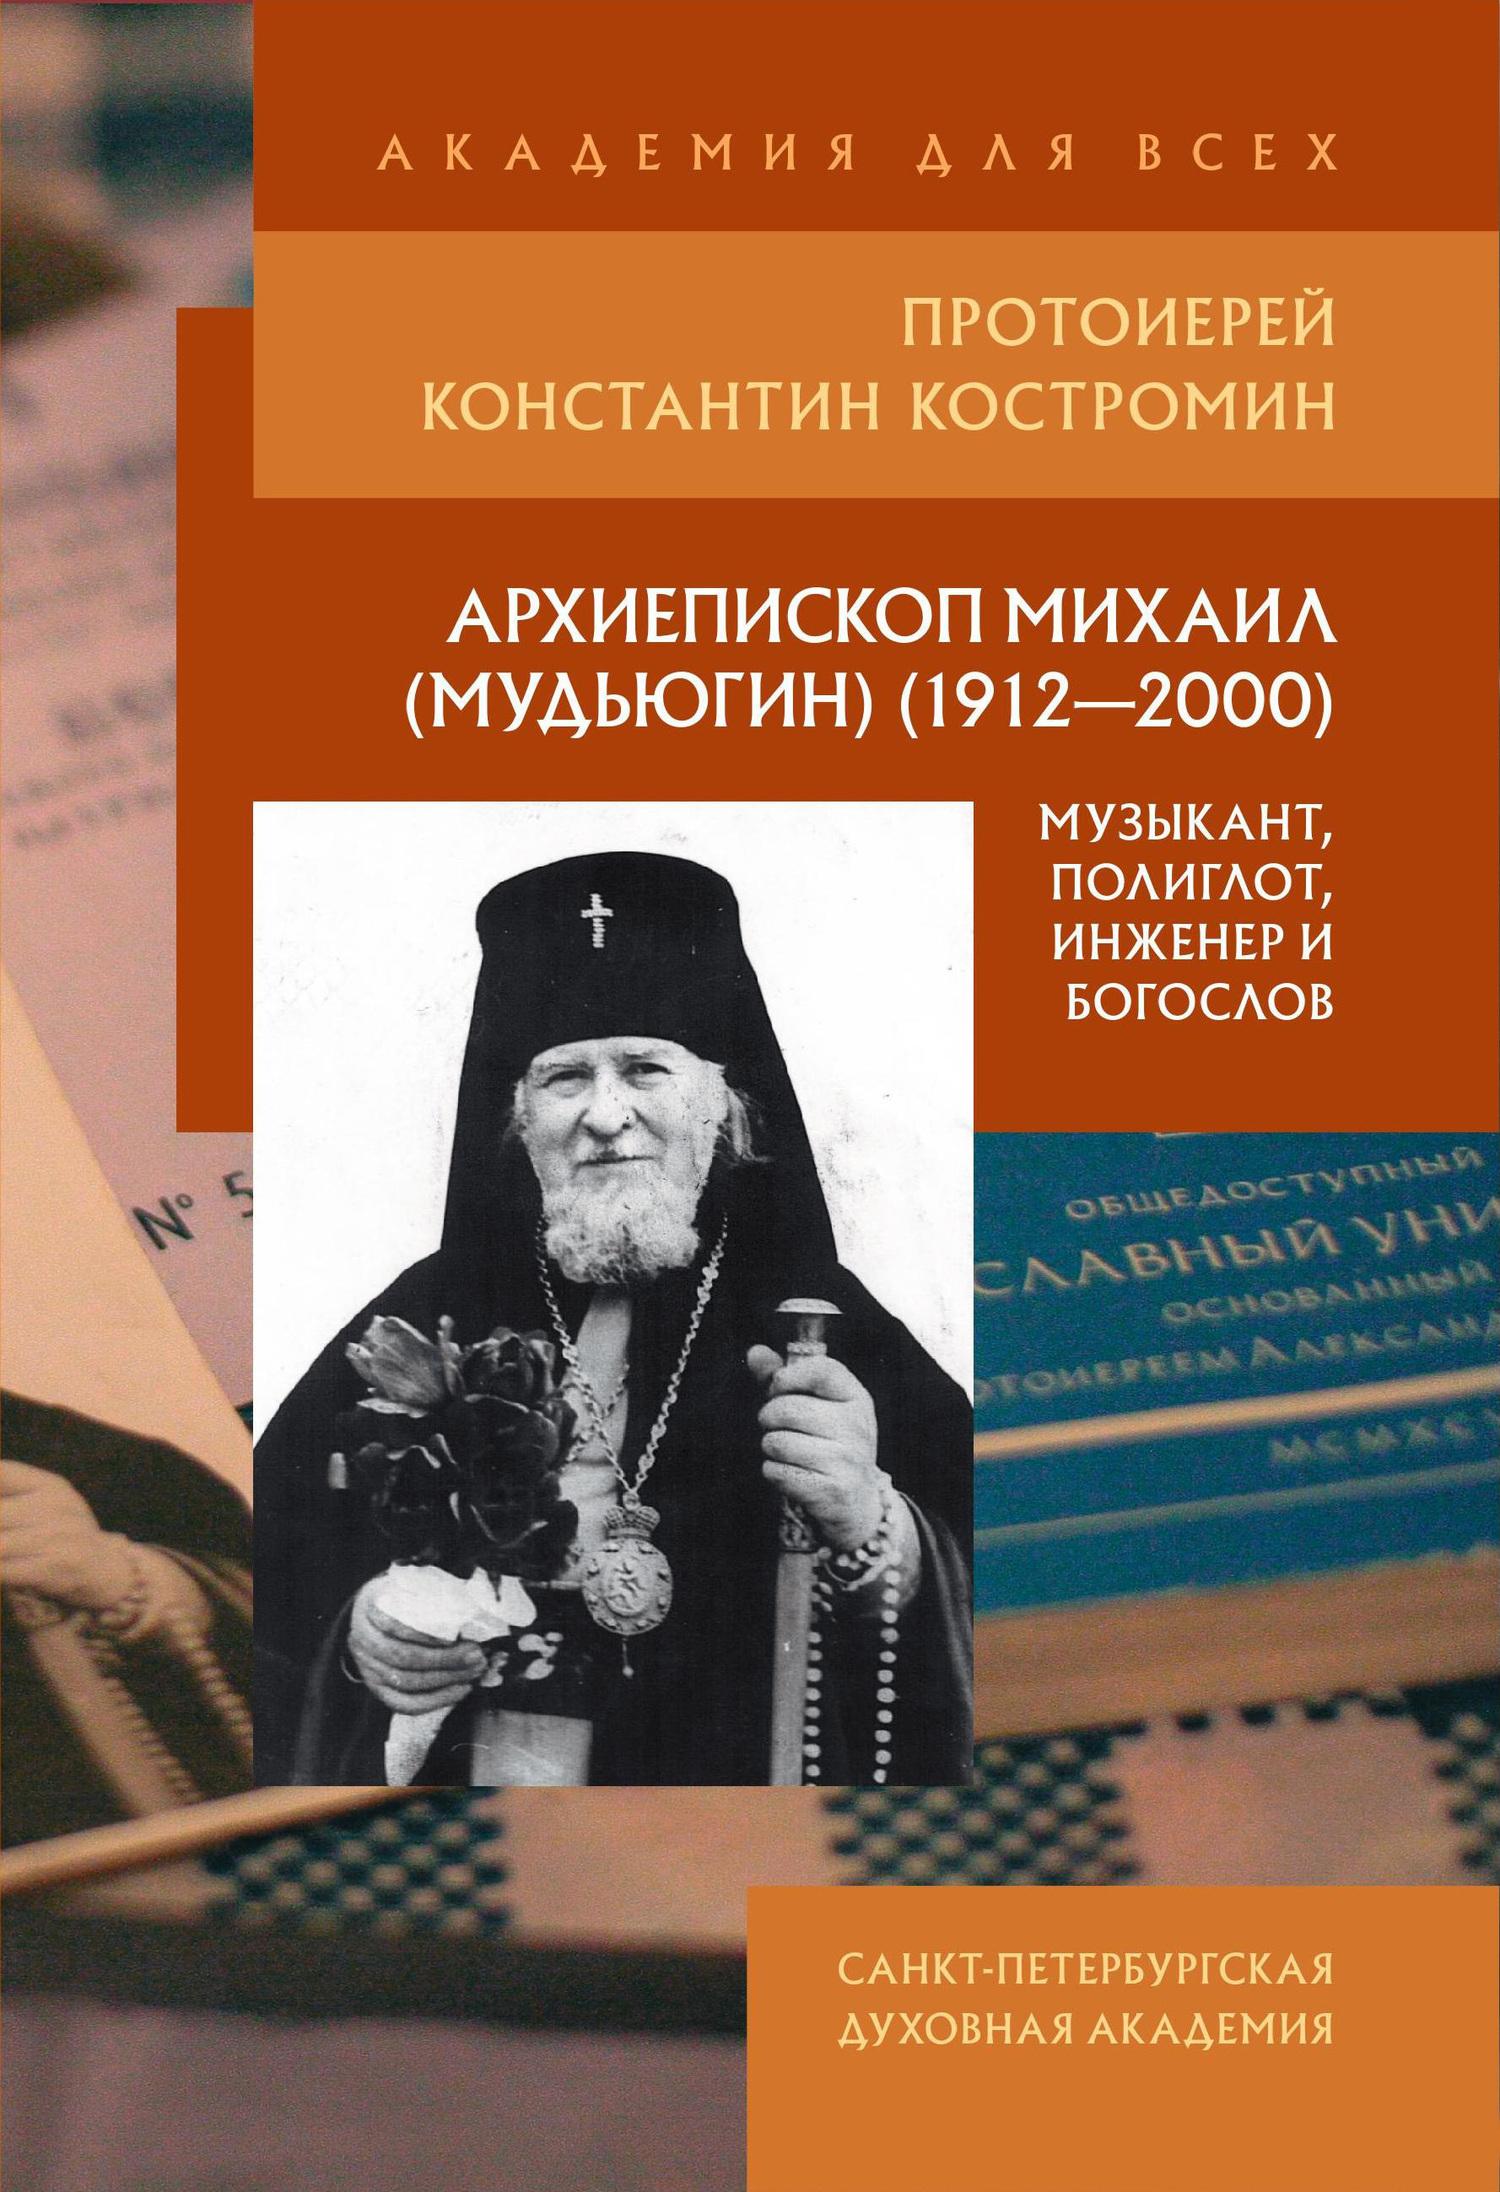 Протоиерей Константин Костромин бесплатно